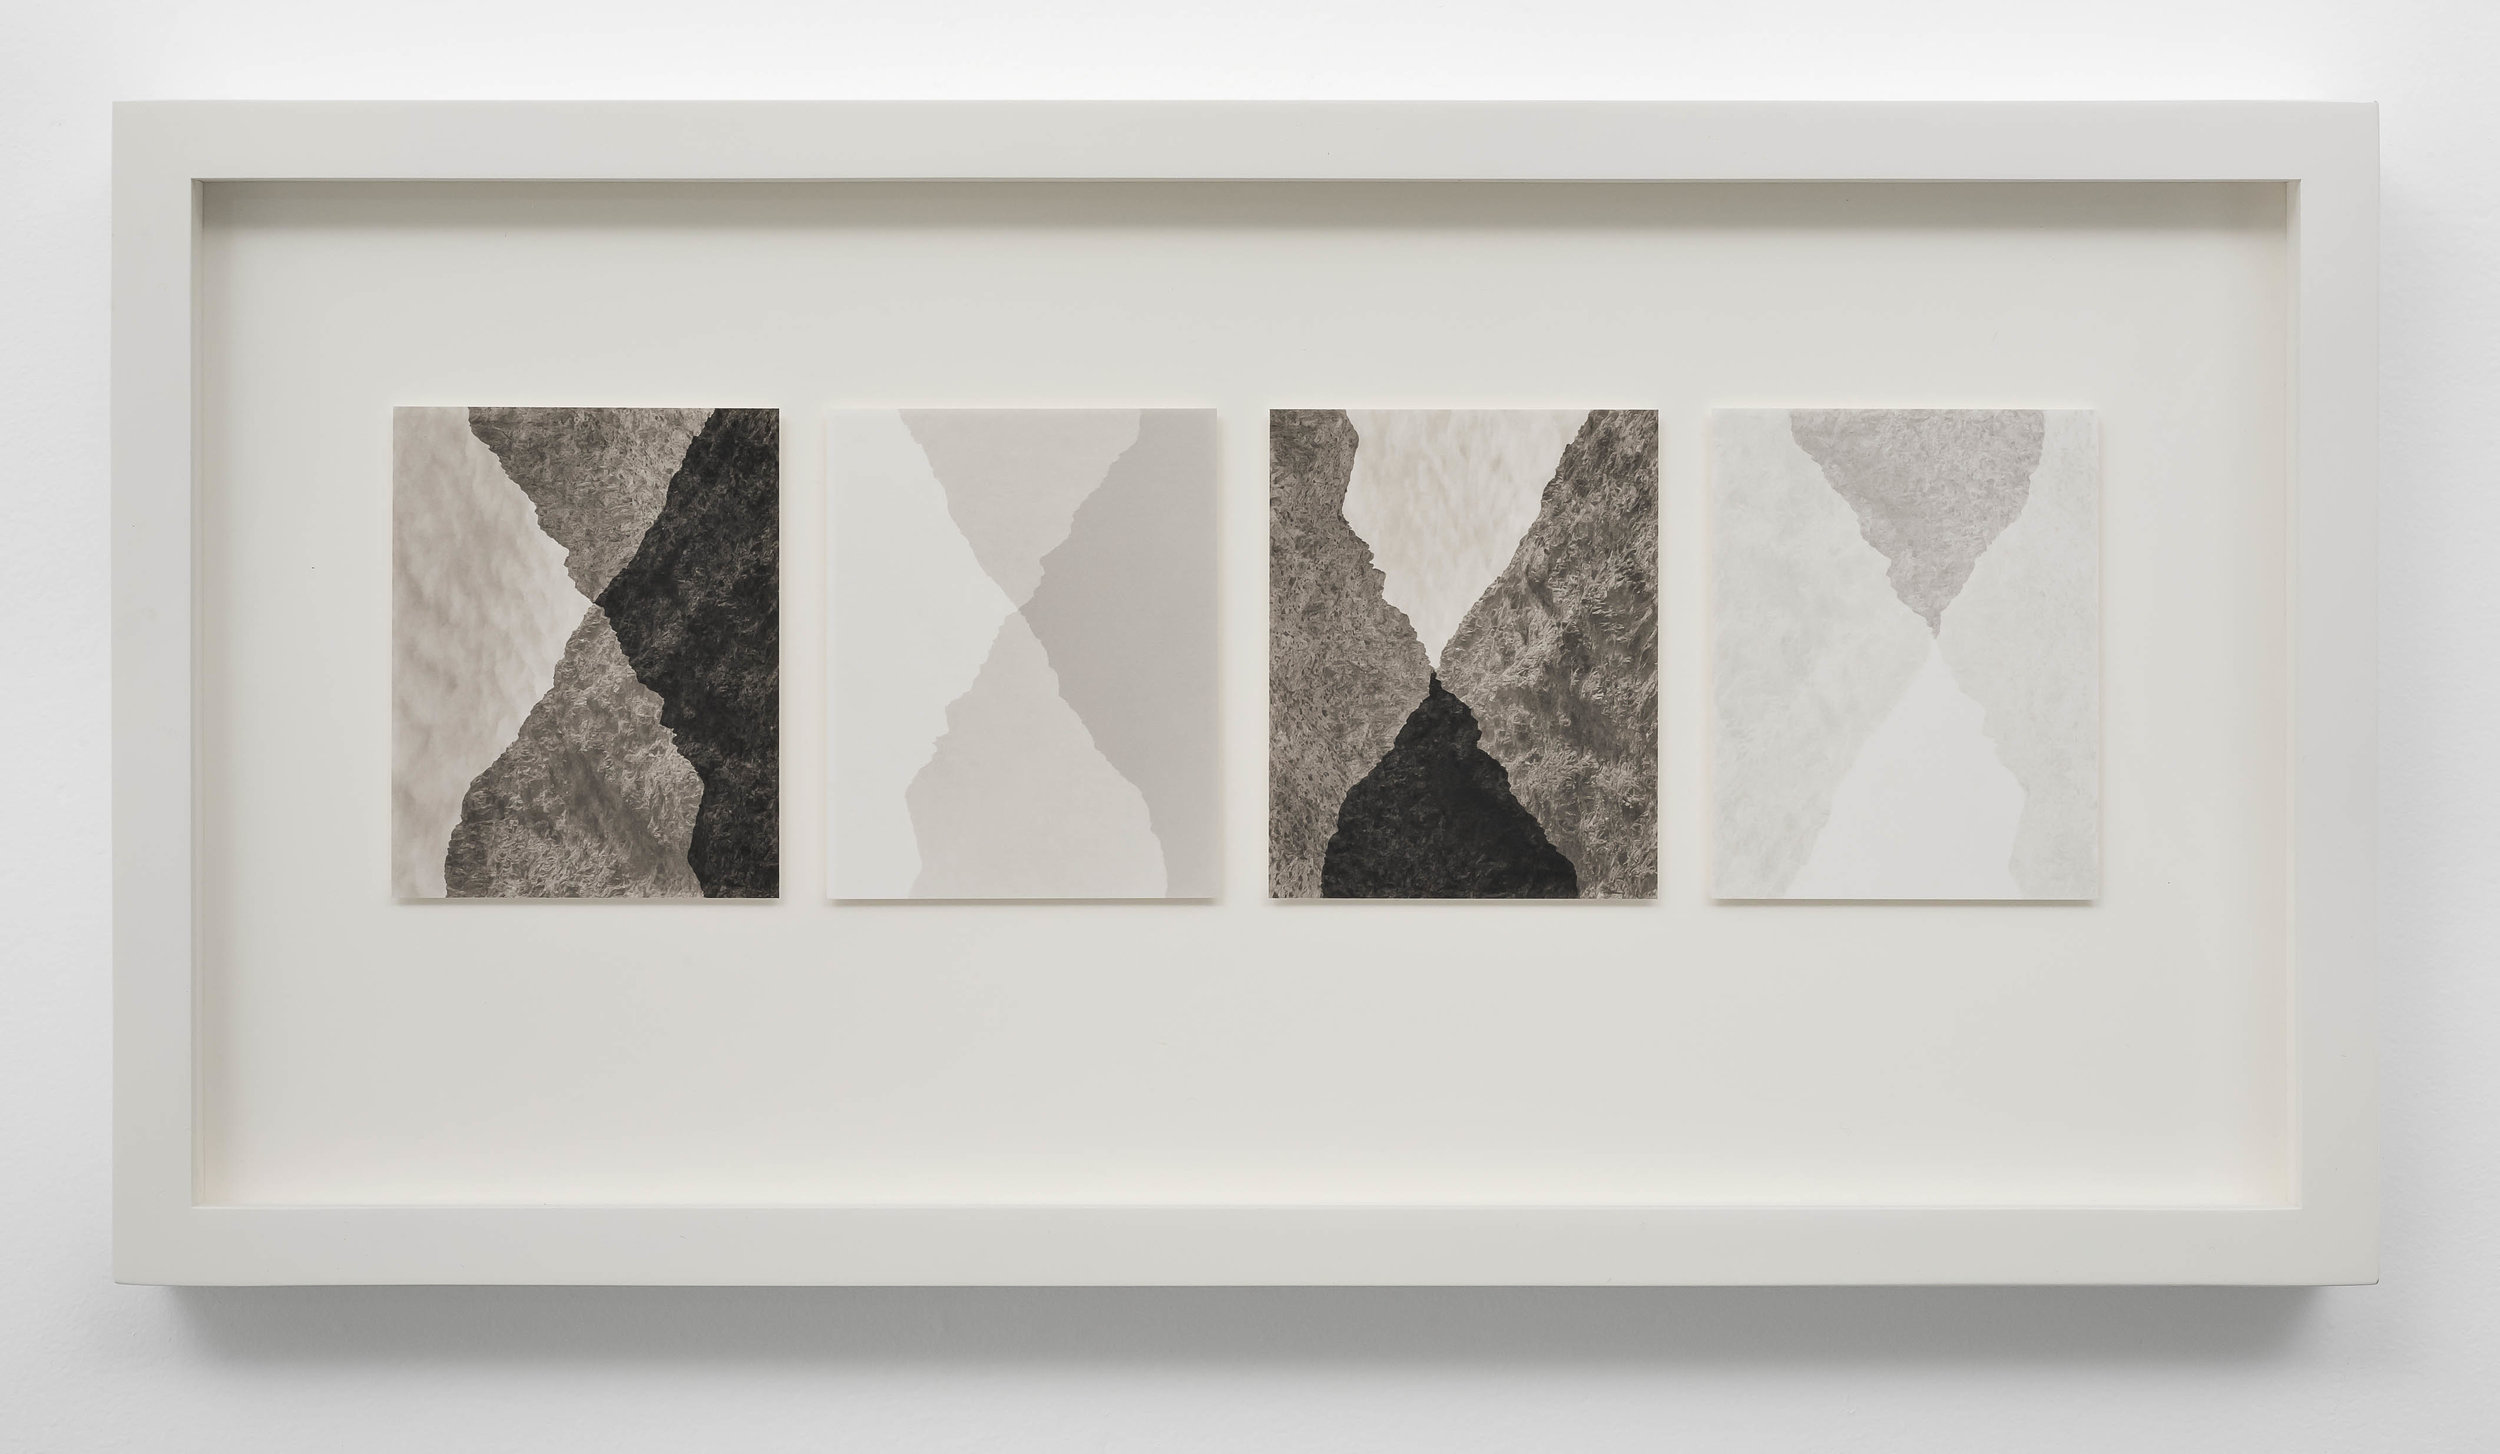 SCOTT B. DAVIS  Four Variations on Two Ridgelines , 2019 Unique paper negative palladium prints, Quartet 5 x 16 inches